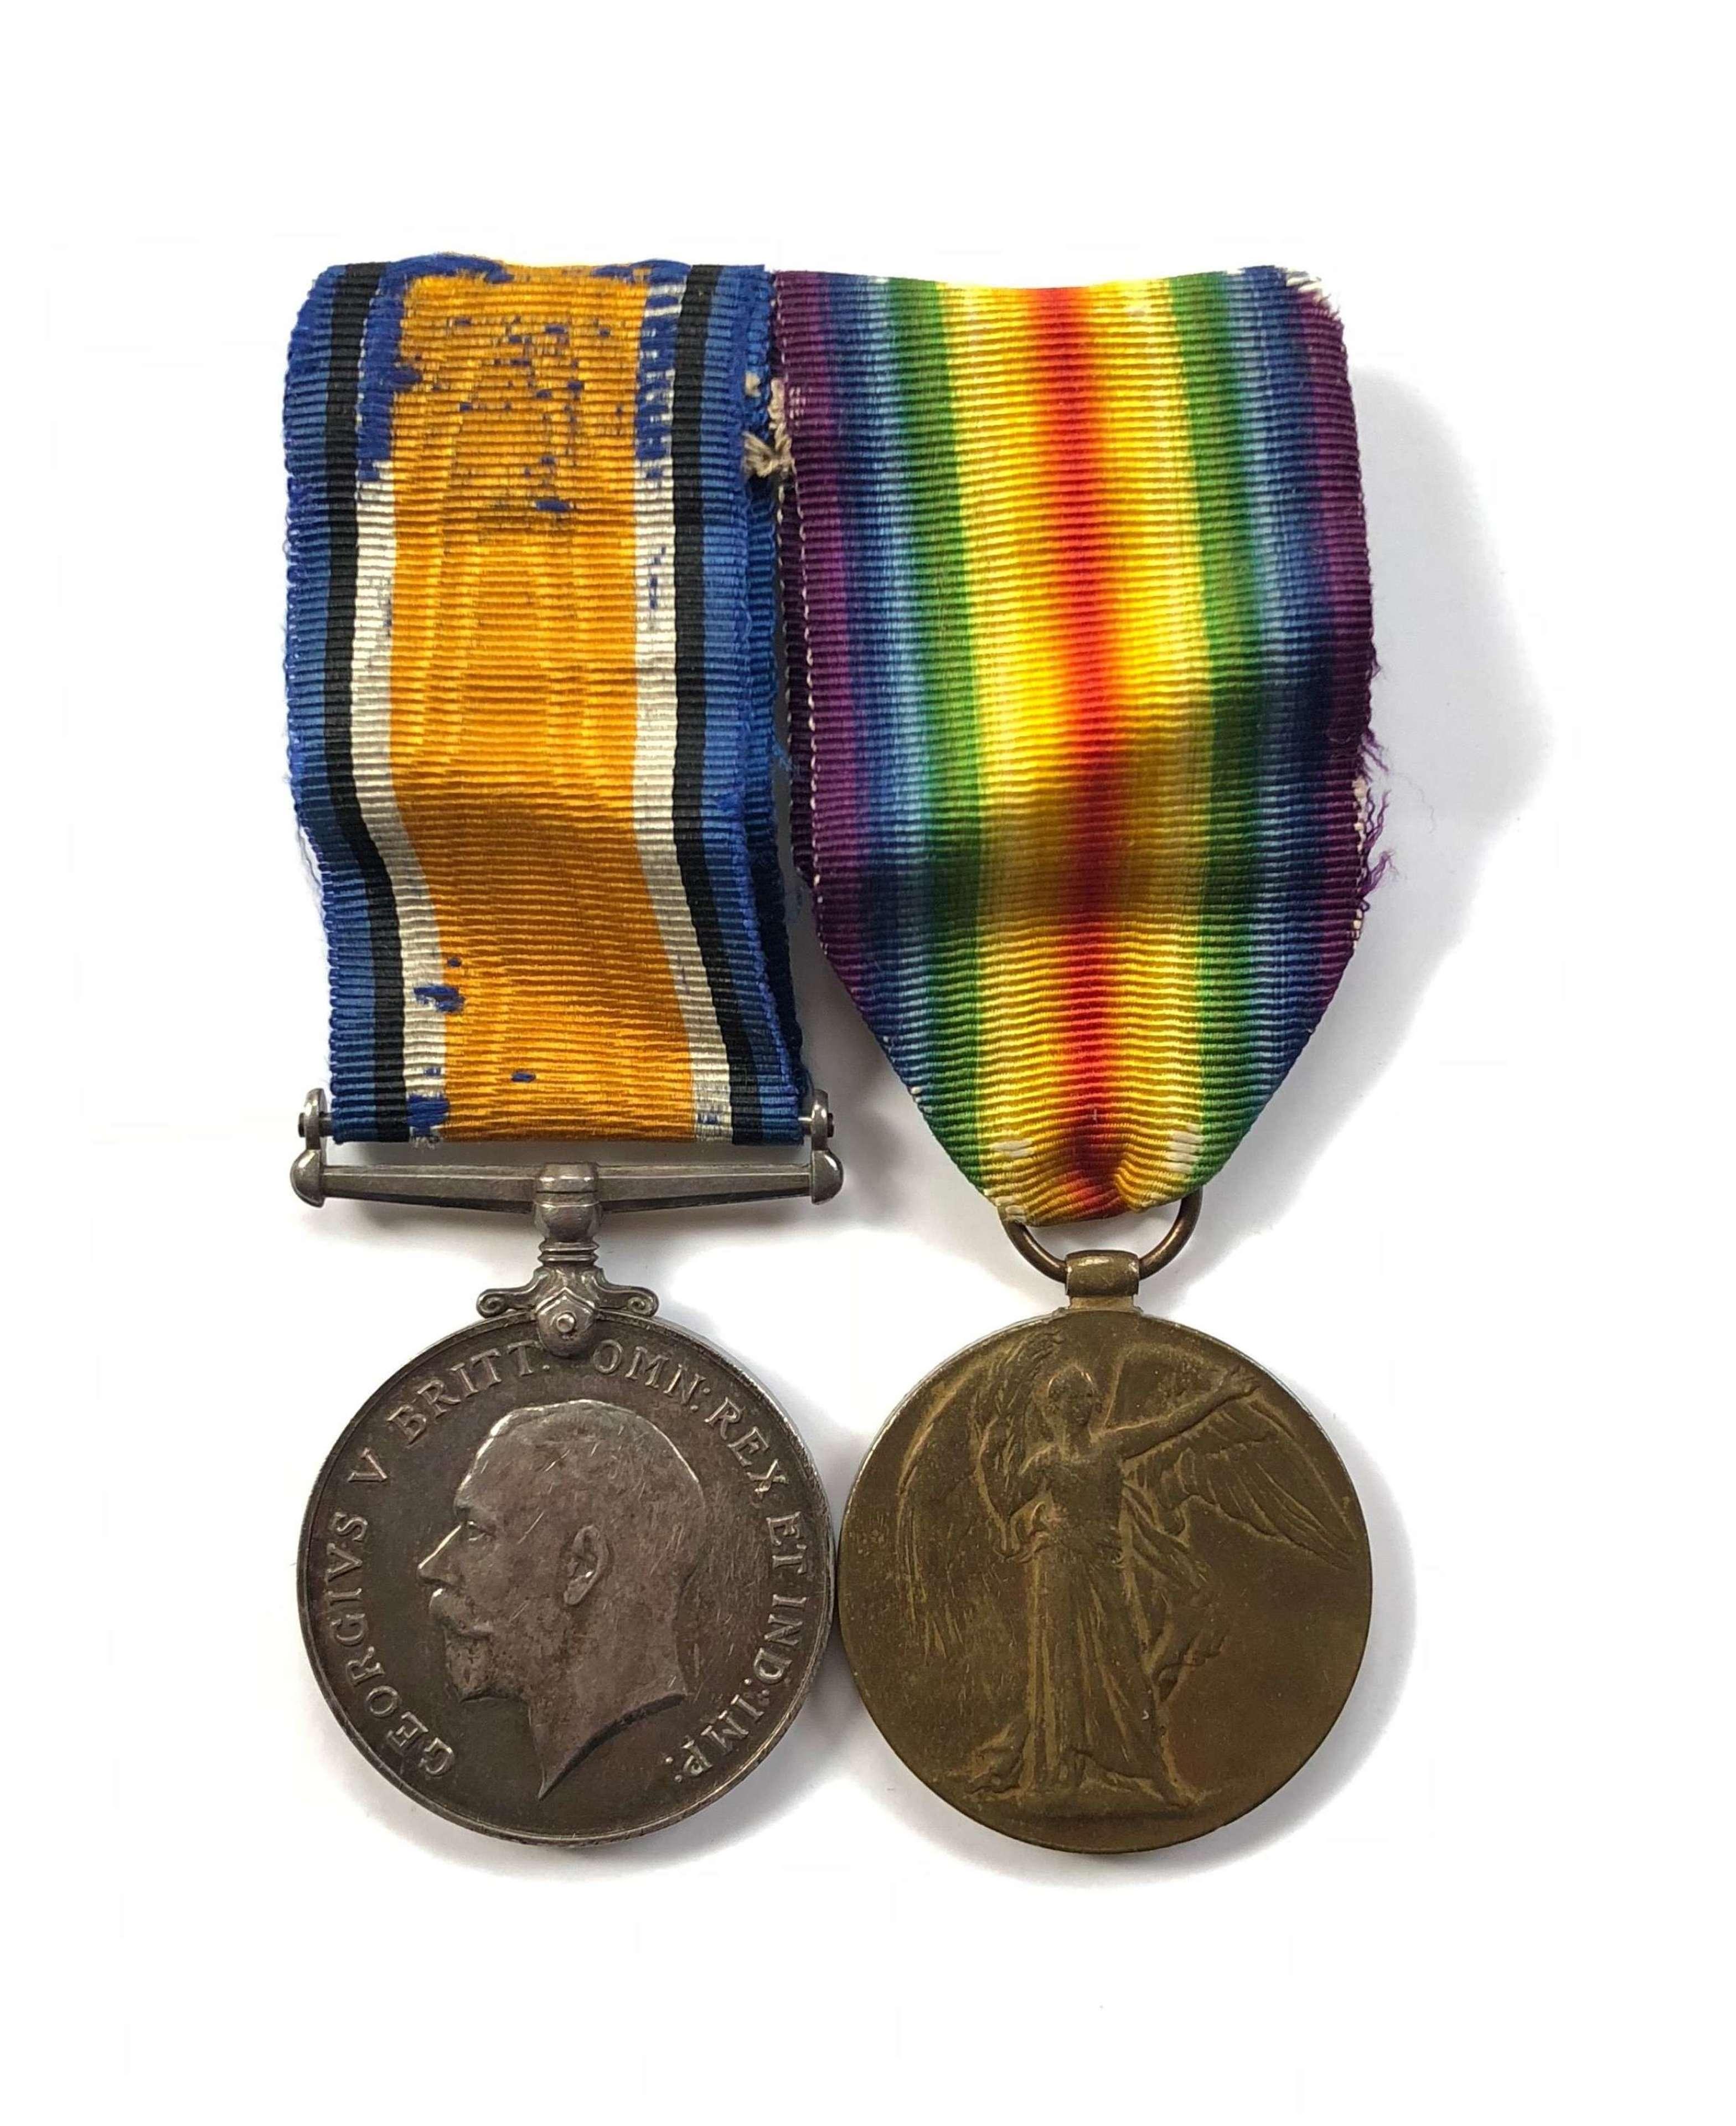 WW1 RNAS Royal Naval Air Service Pair of Medals.